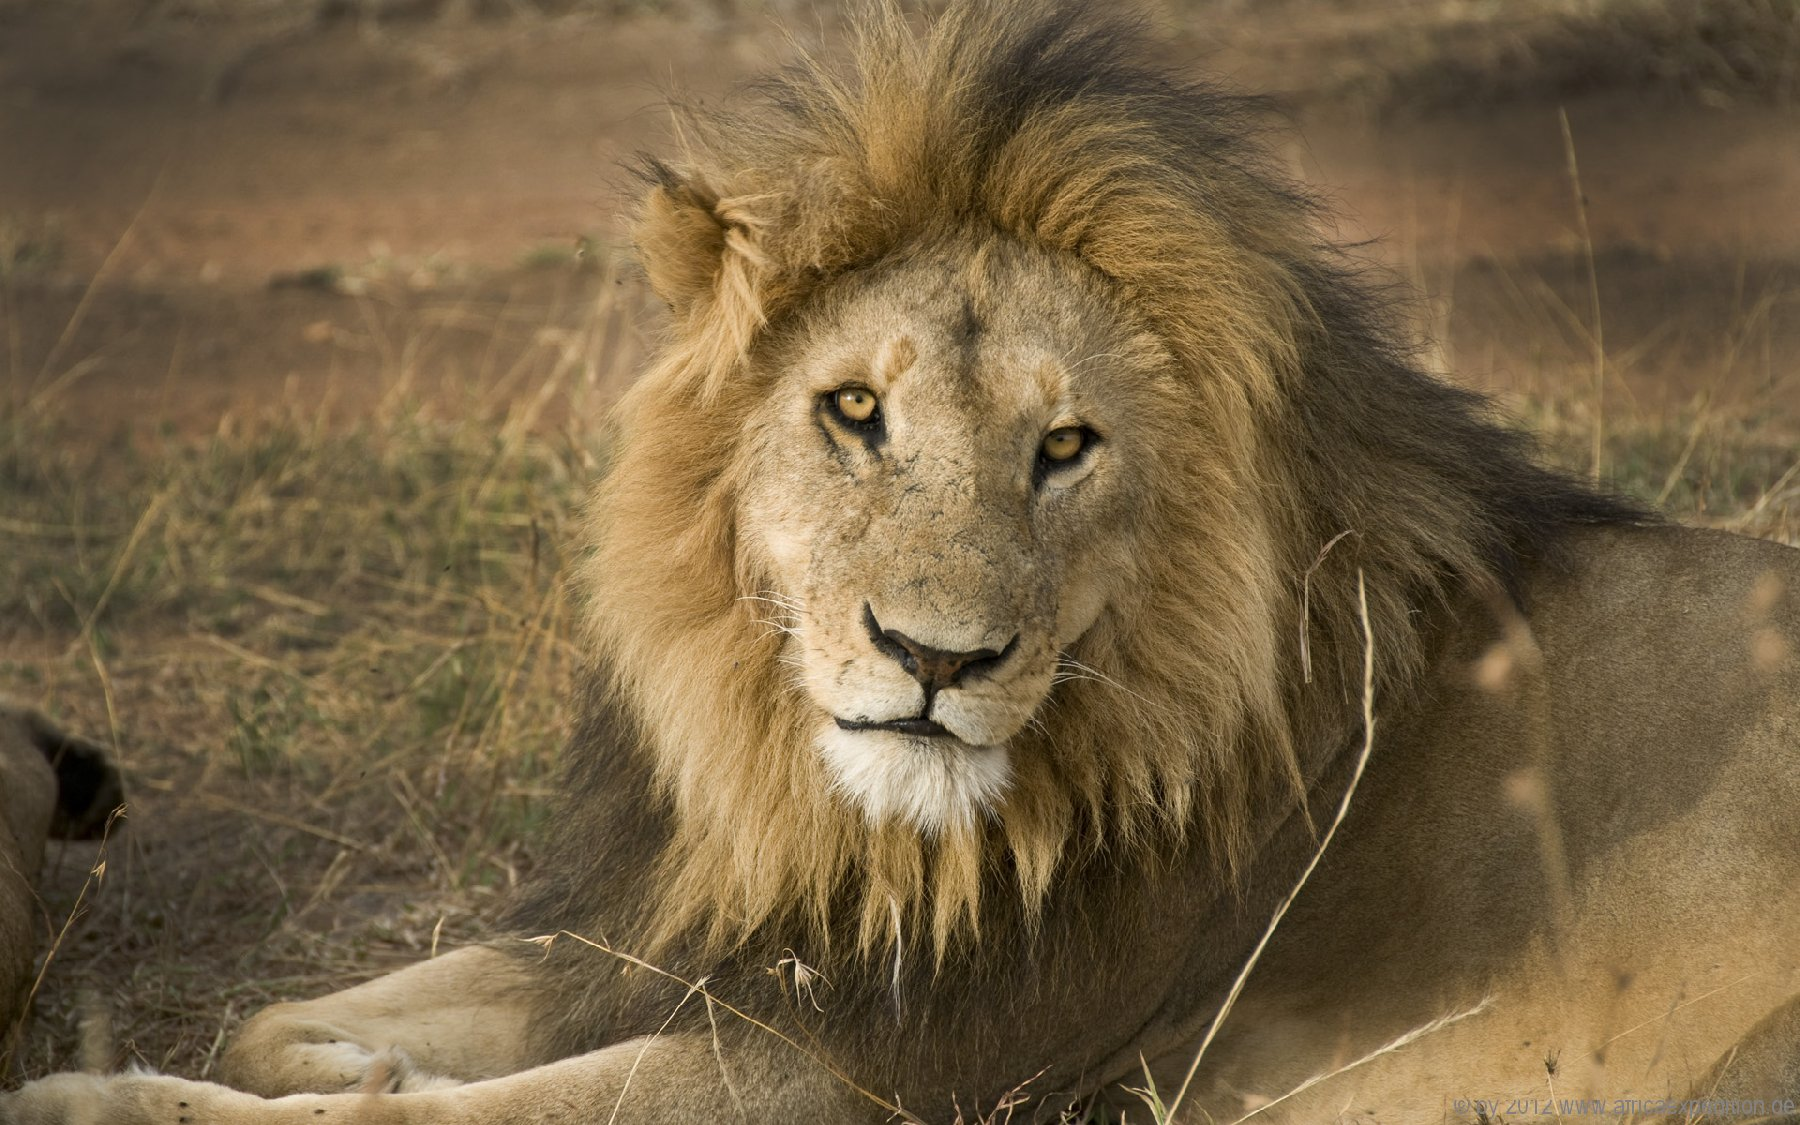 tanzania_africaexpedition_de_002